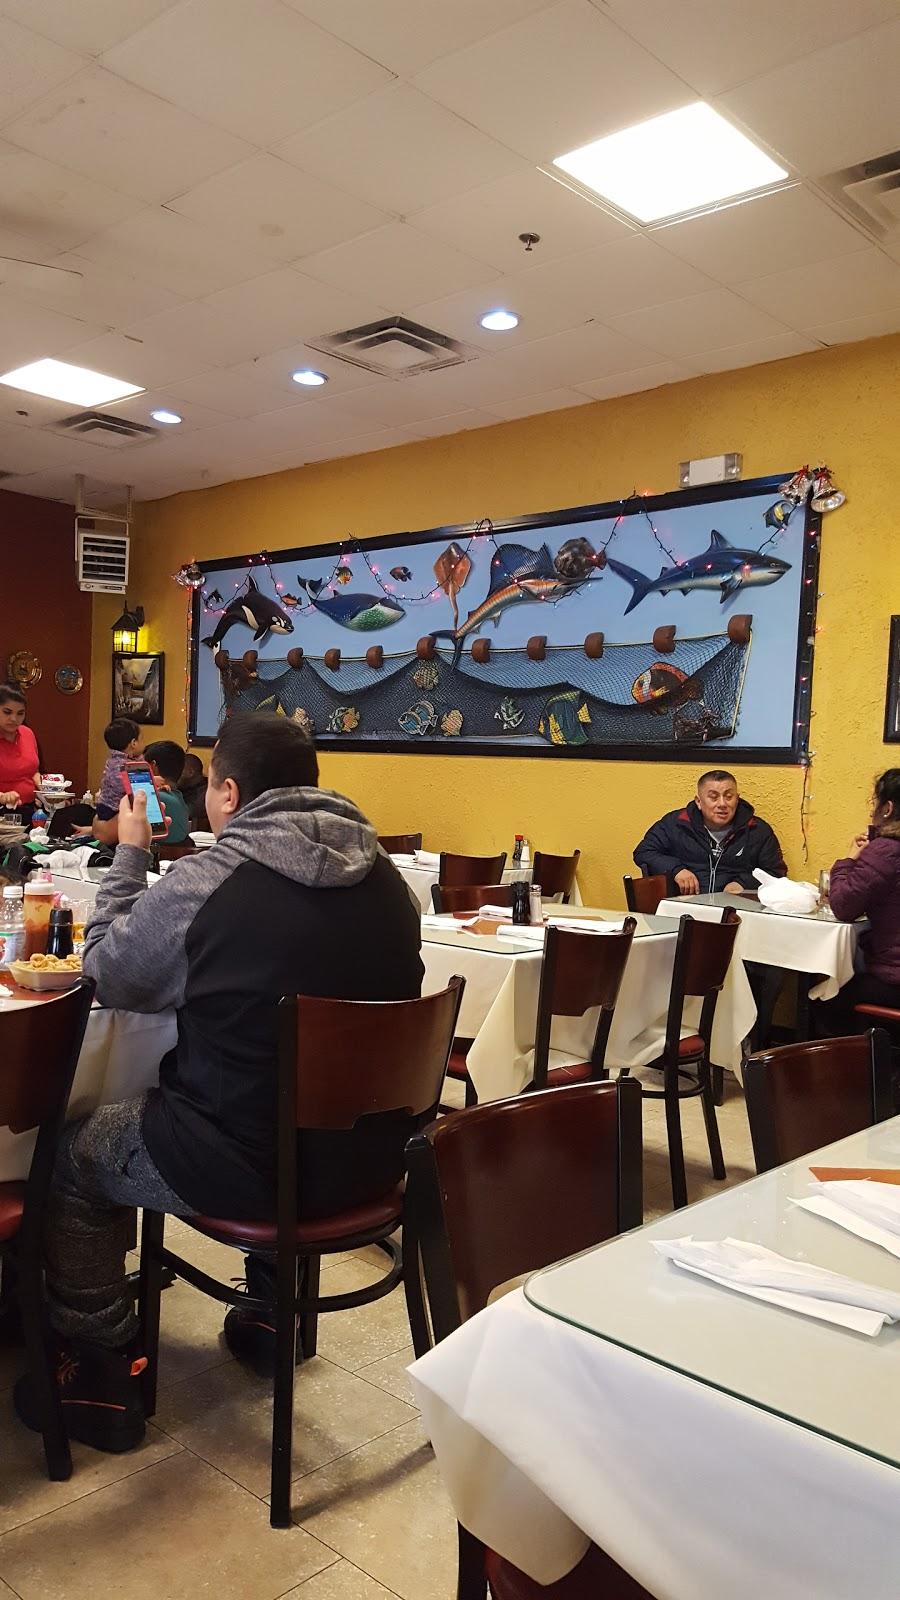 Don Julio - restaurant  | Photo 1 of 10 | Address: 50 Marshall St, Elizabeth, NJ 07206, USA | Phone: (908) 820-0100